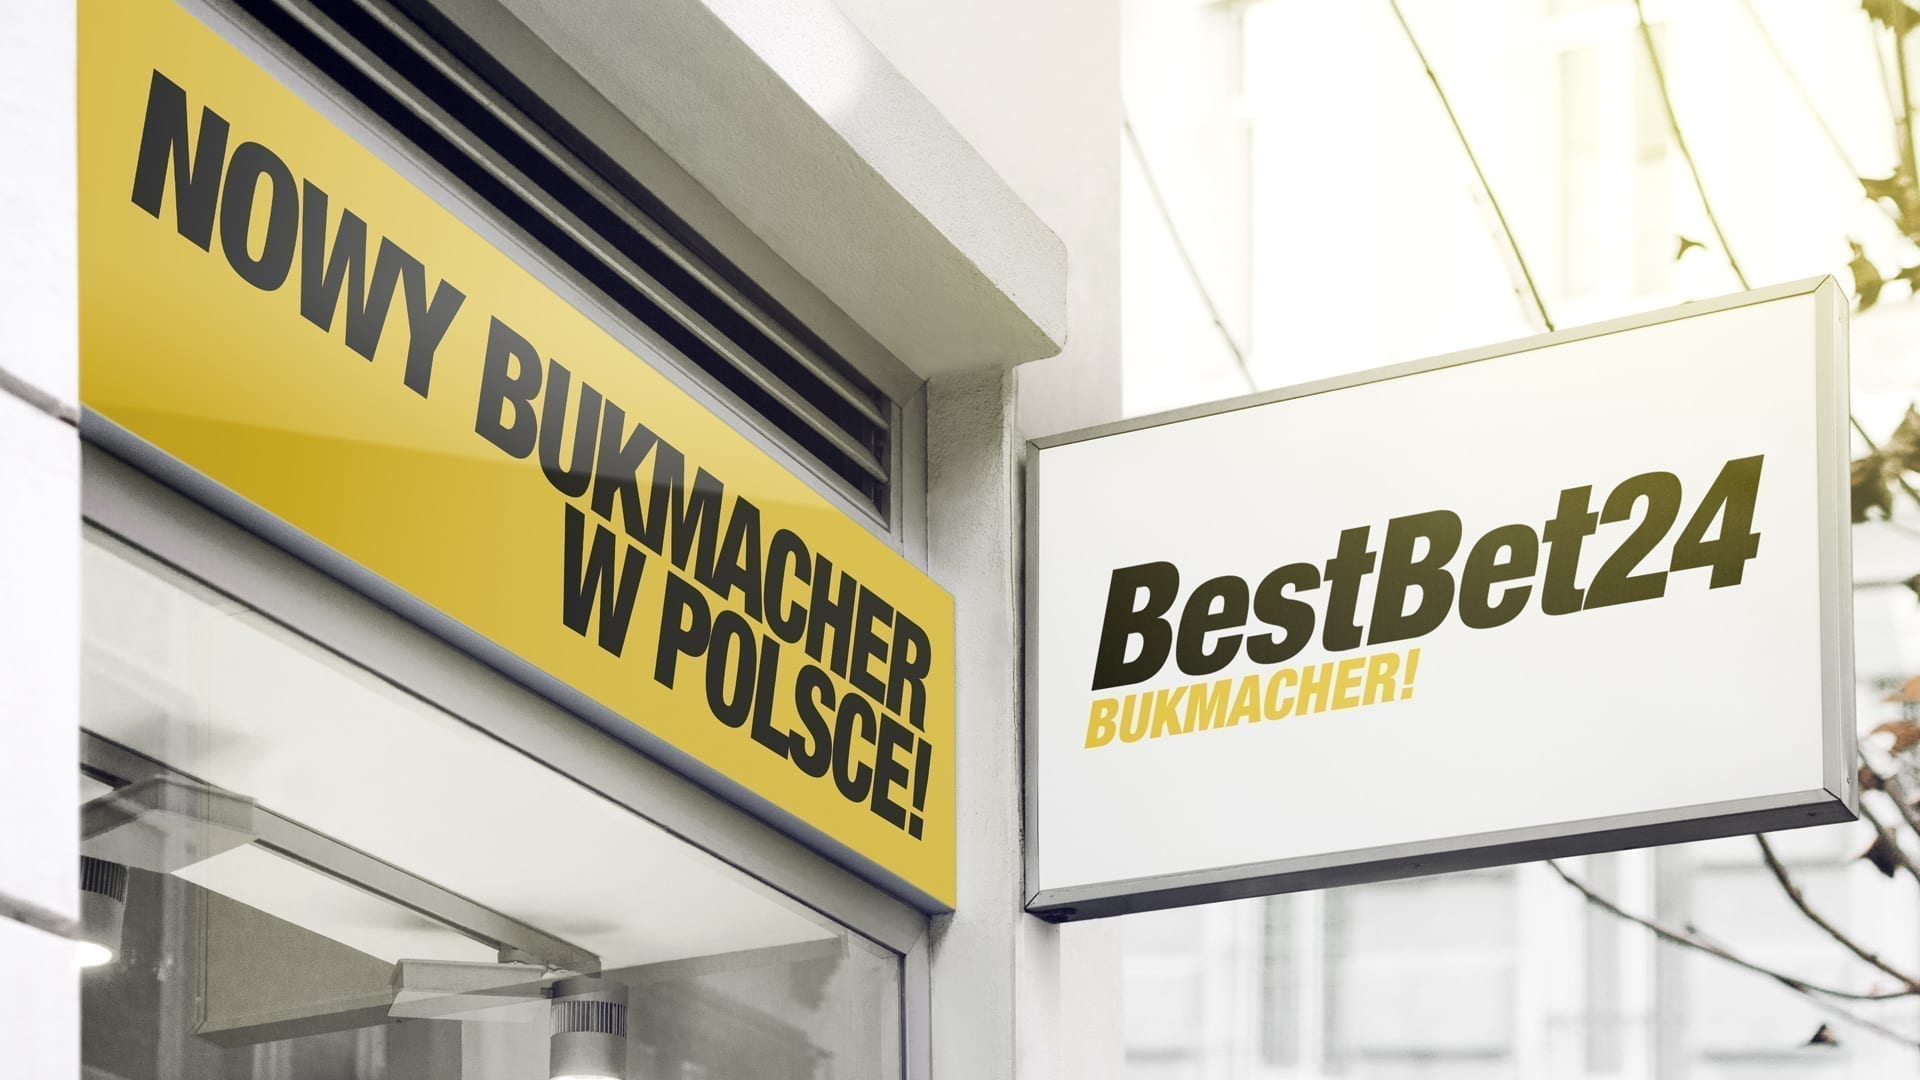 BestBet24 - nowy bukmacher